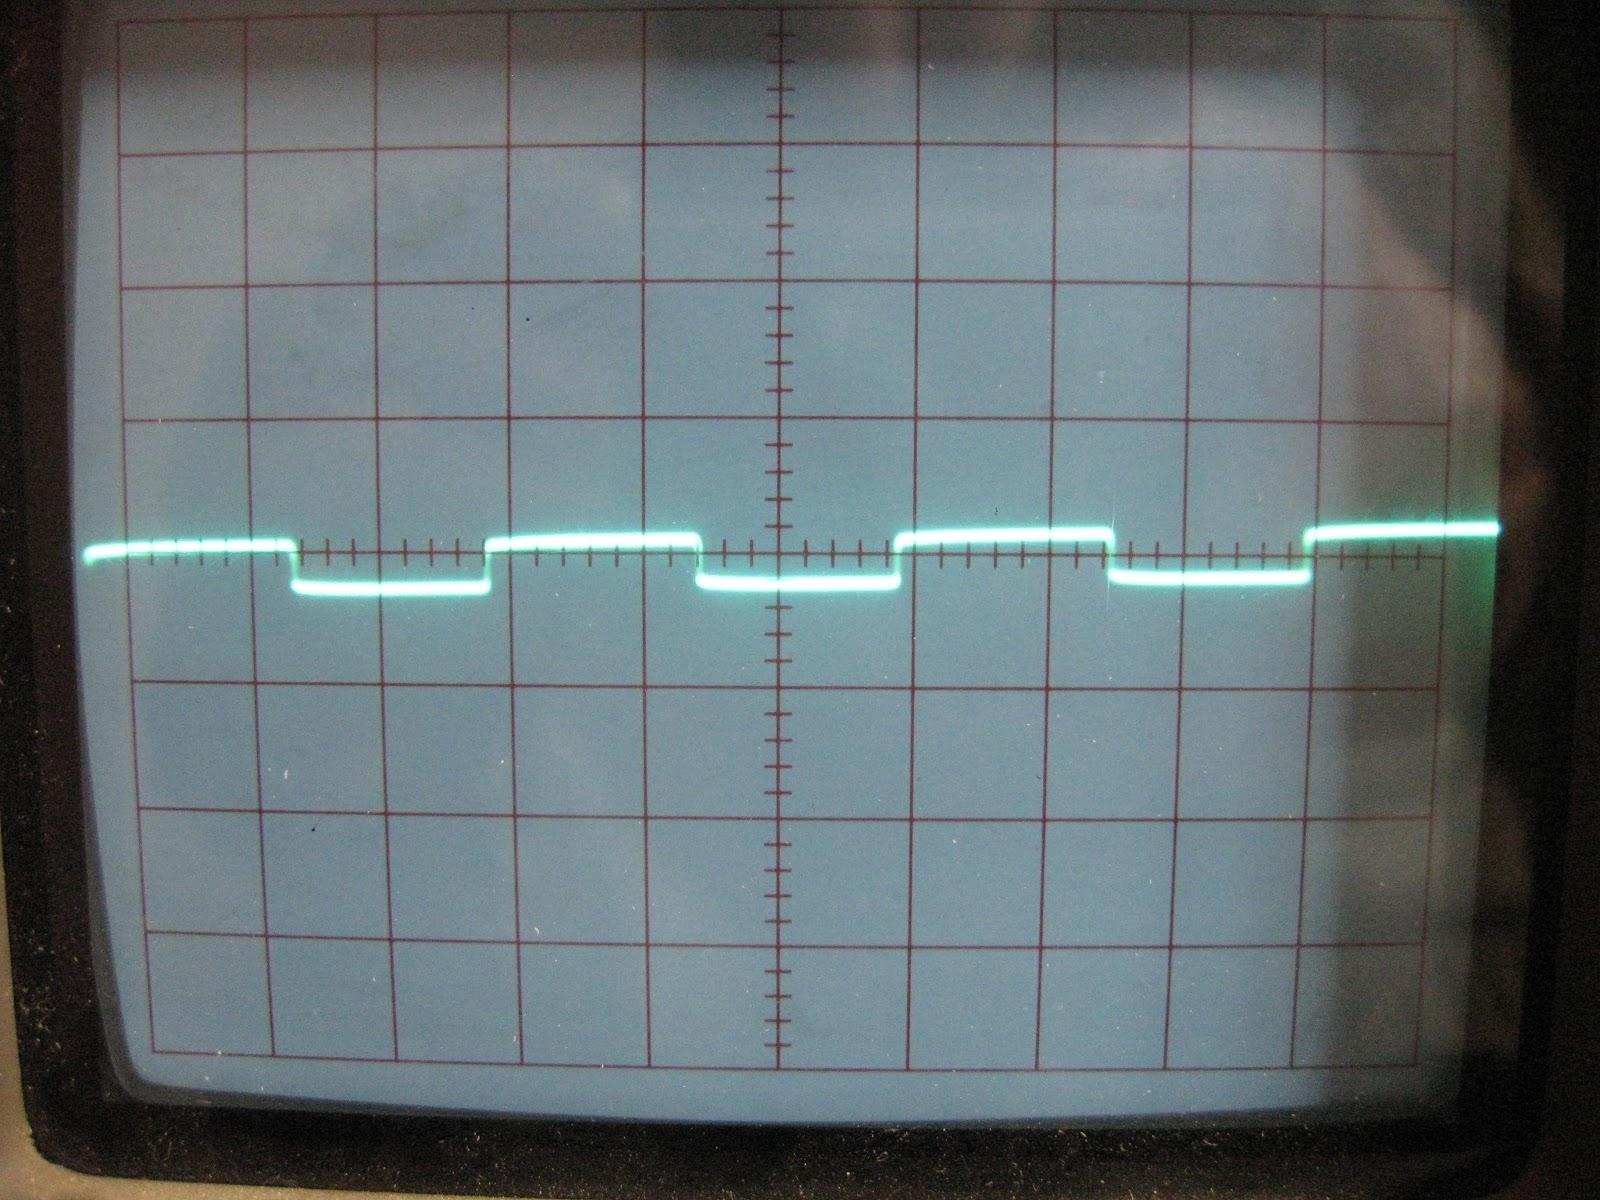 DIY Guitar pedal projects: April 2013